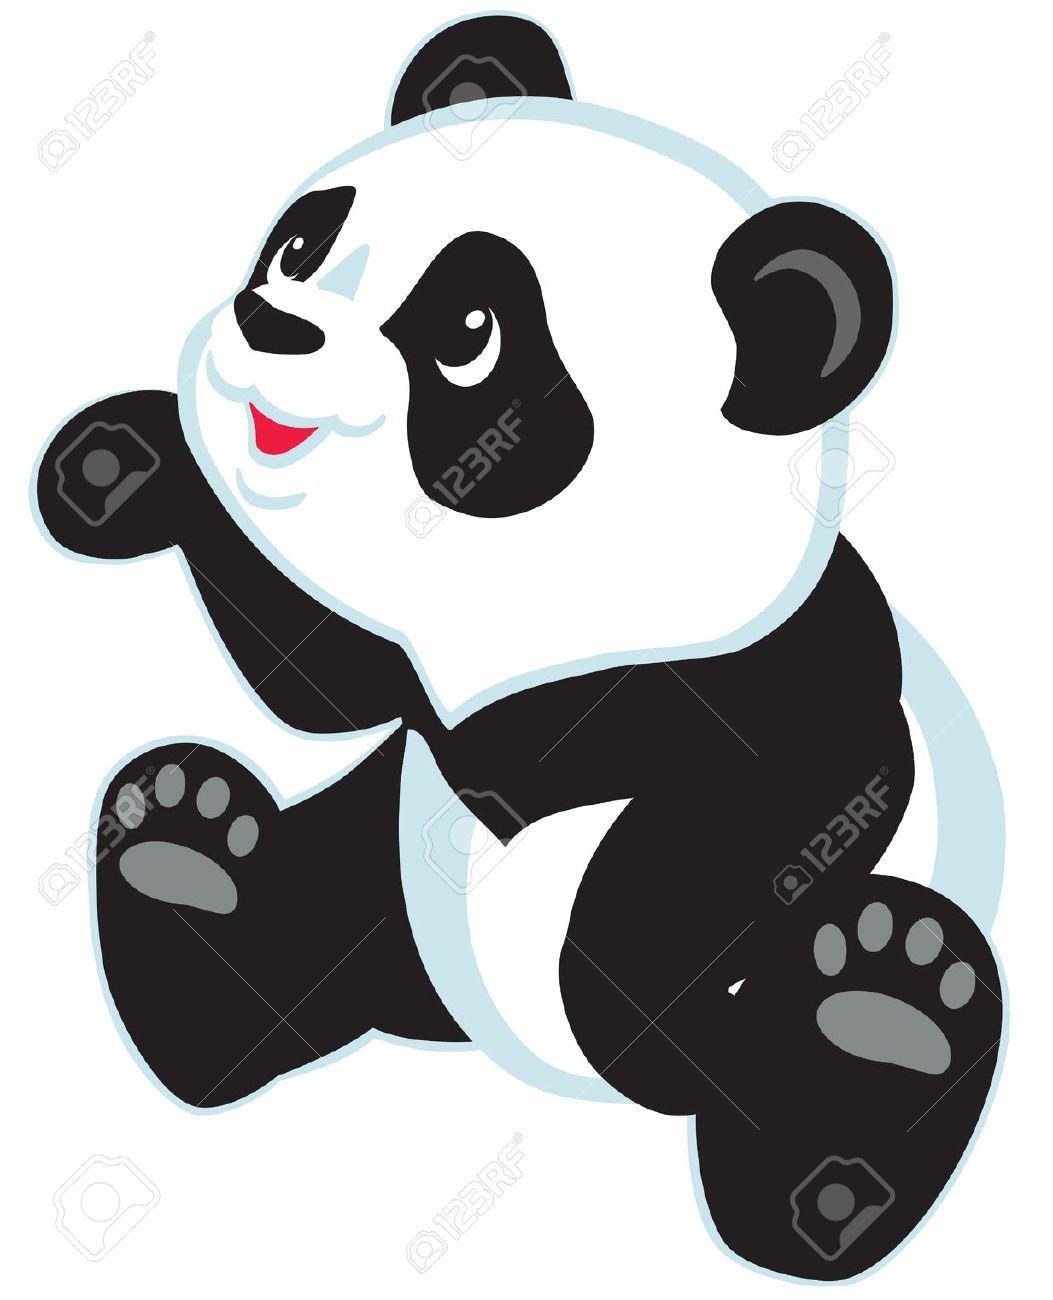 Imagen De Oso Panda Tierno Imagenes Pinterest Pandas